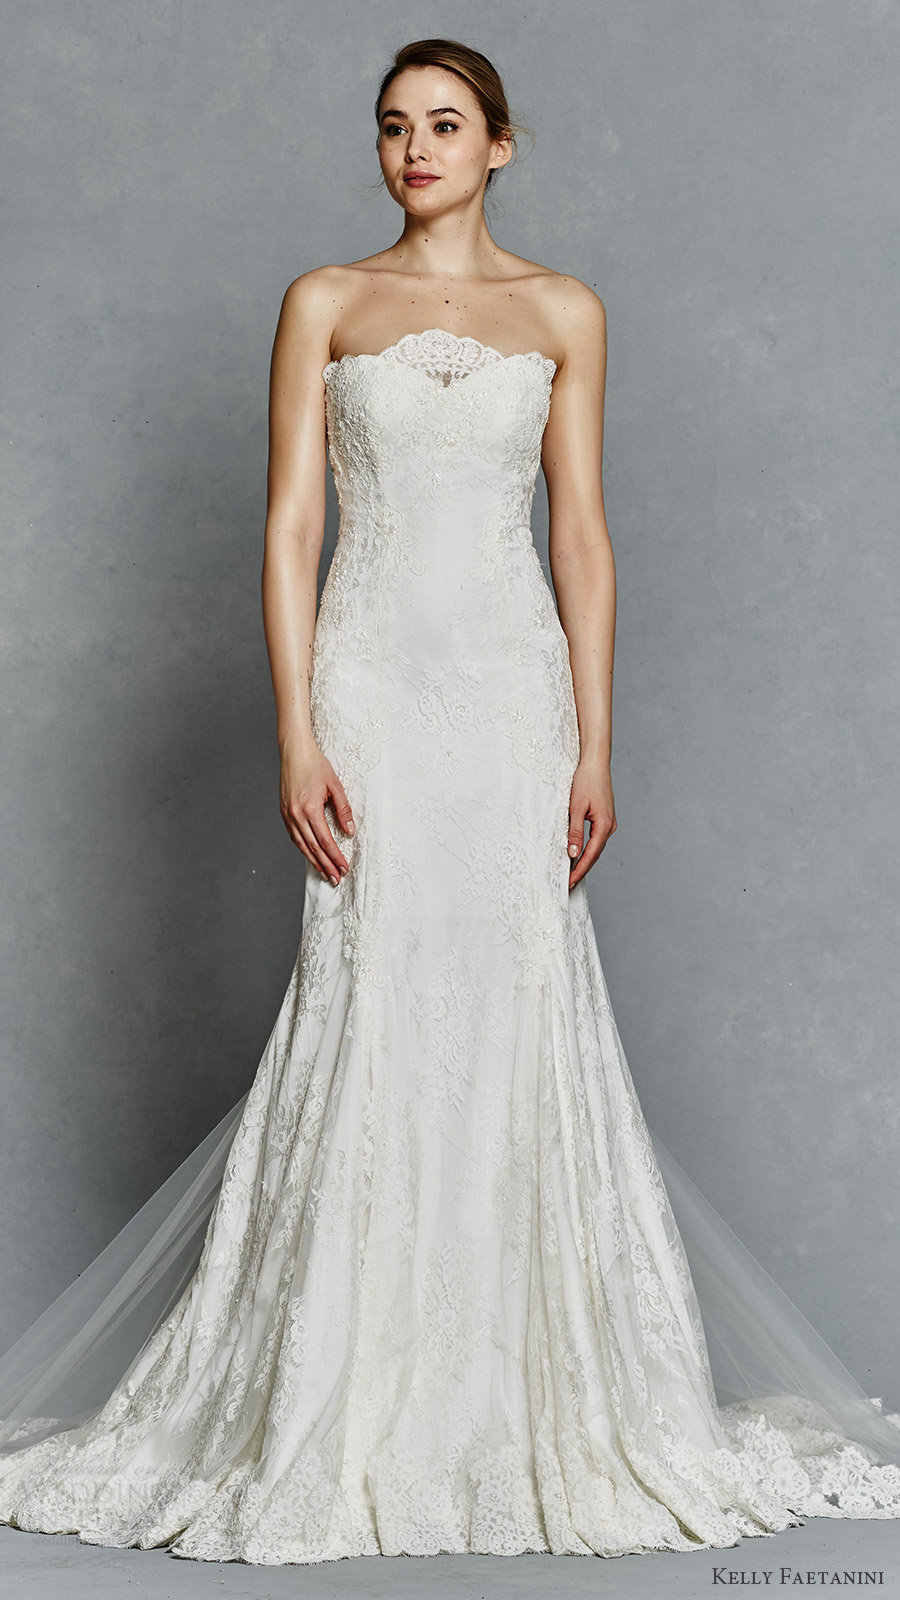 b4a3ceba2 kelly faetanini bridal spring 2017 strapless sweetheart chantilly lace fit  flare wedding dress (hazel)